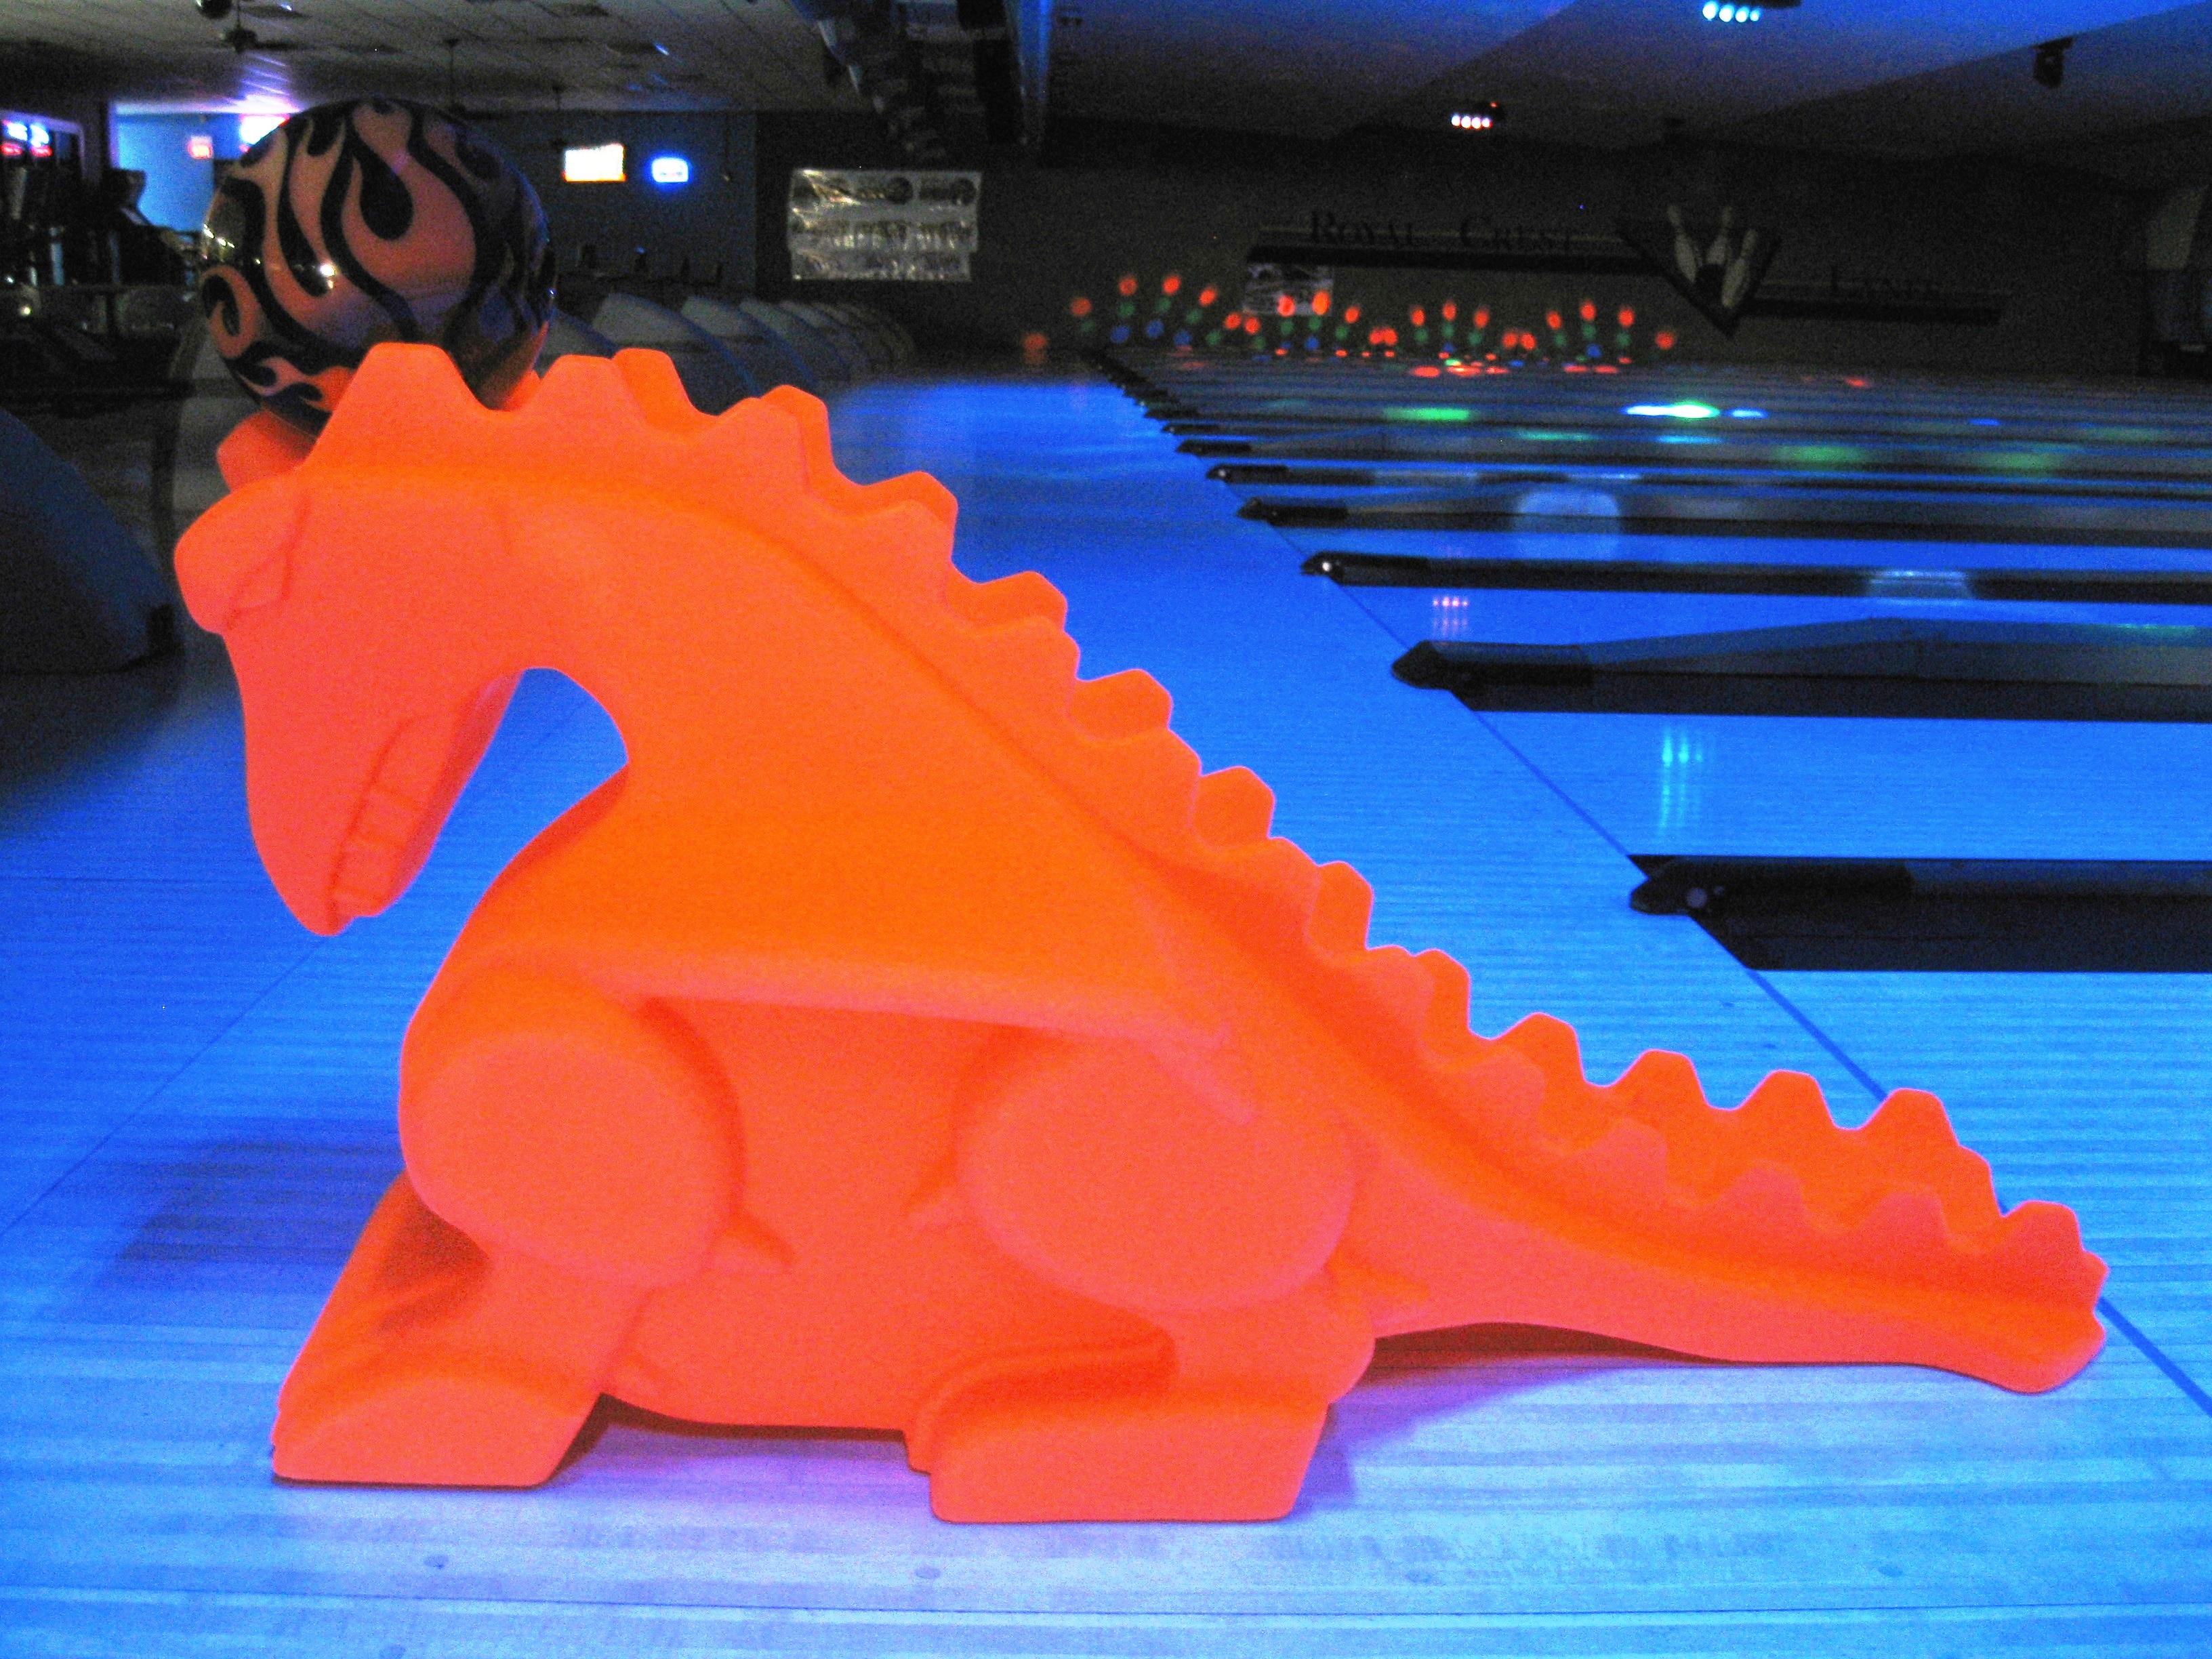 Jayhawk Dragon Bowling Ball Ramp